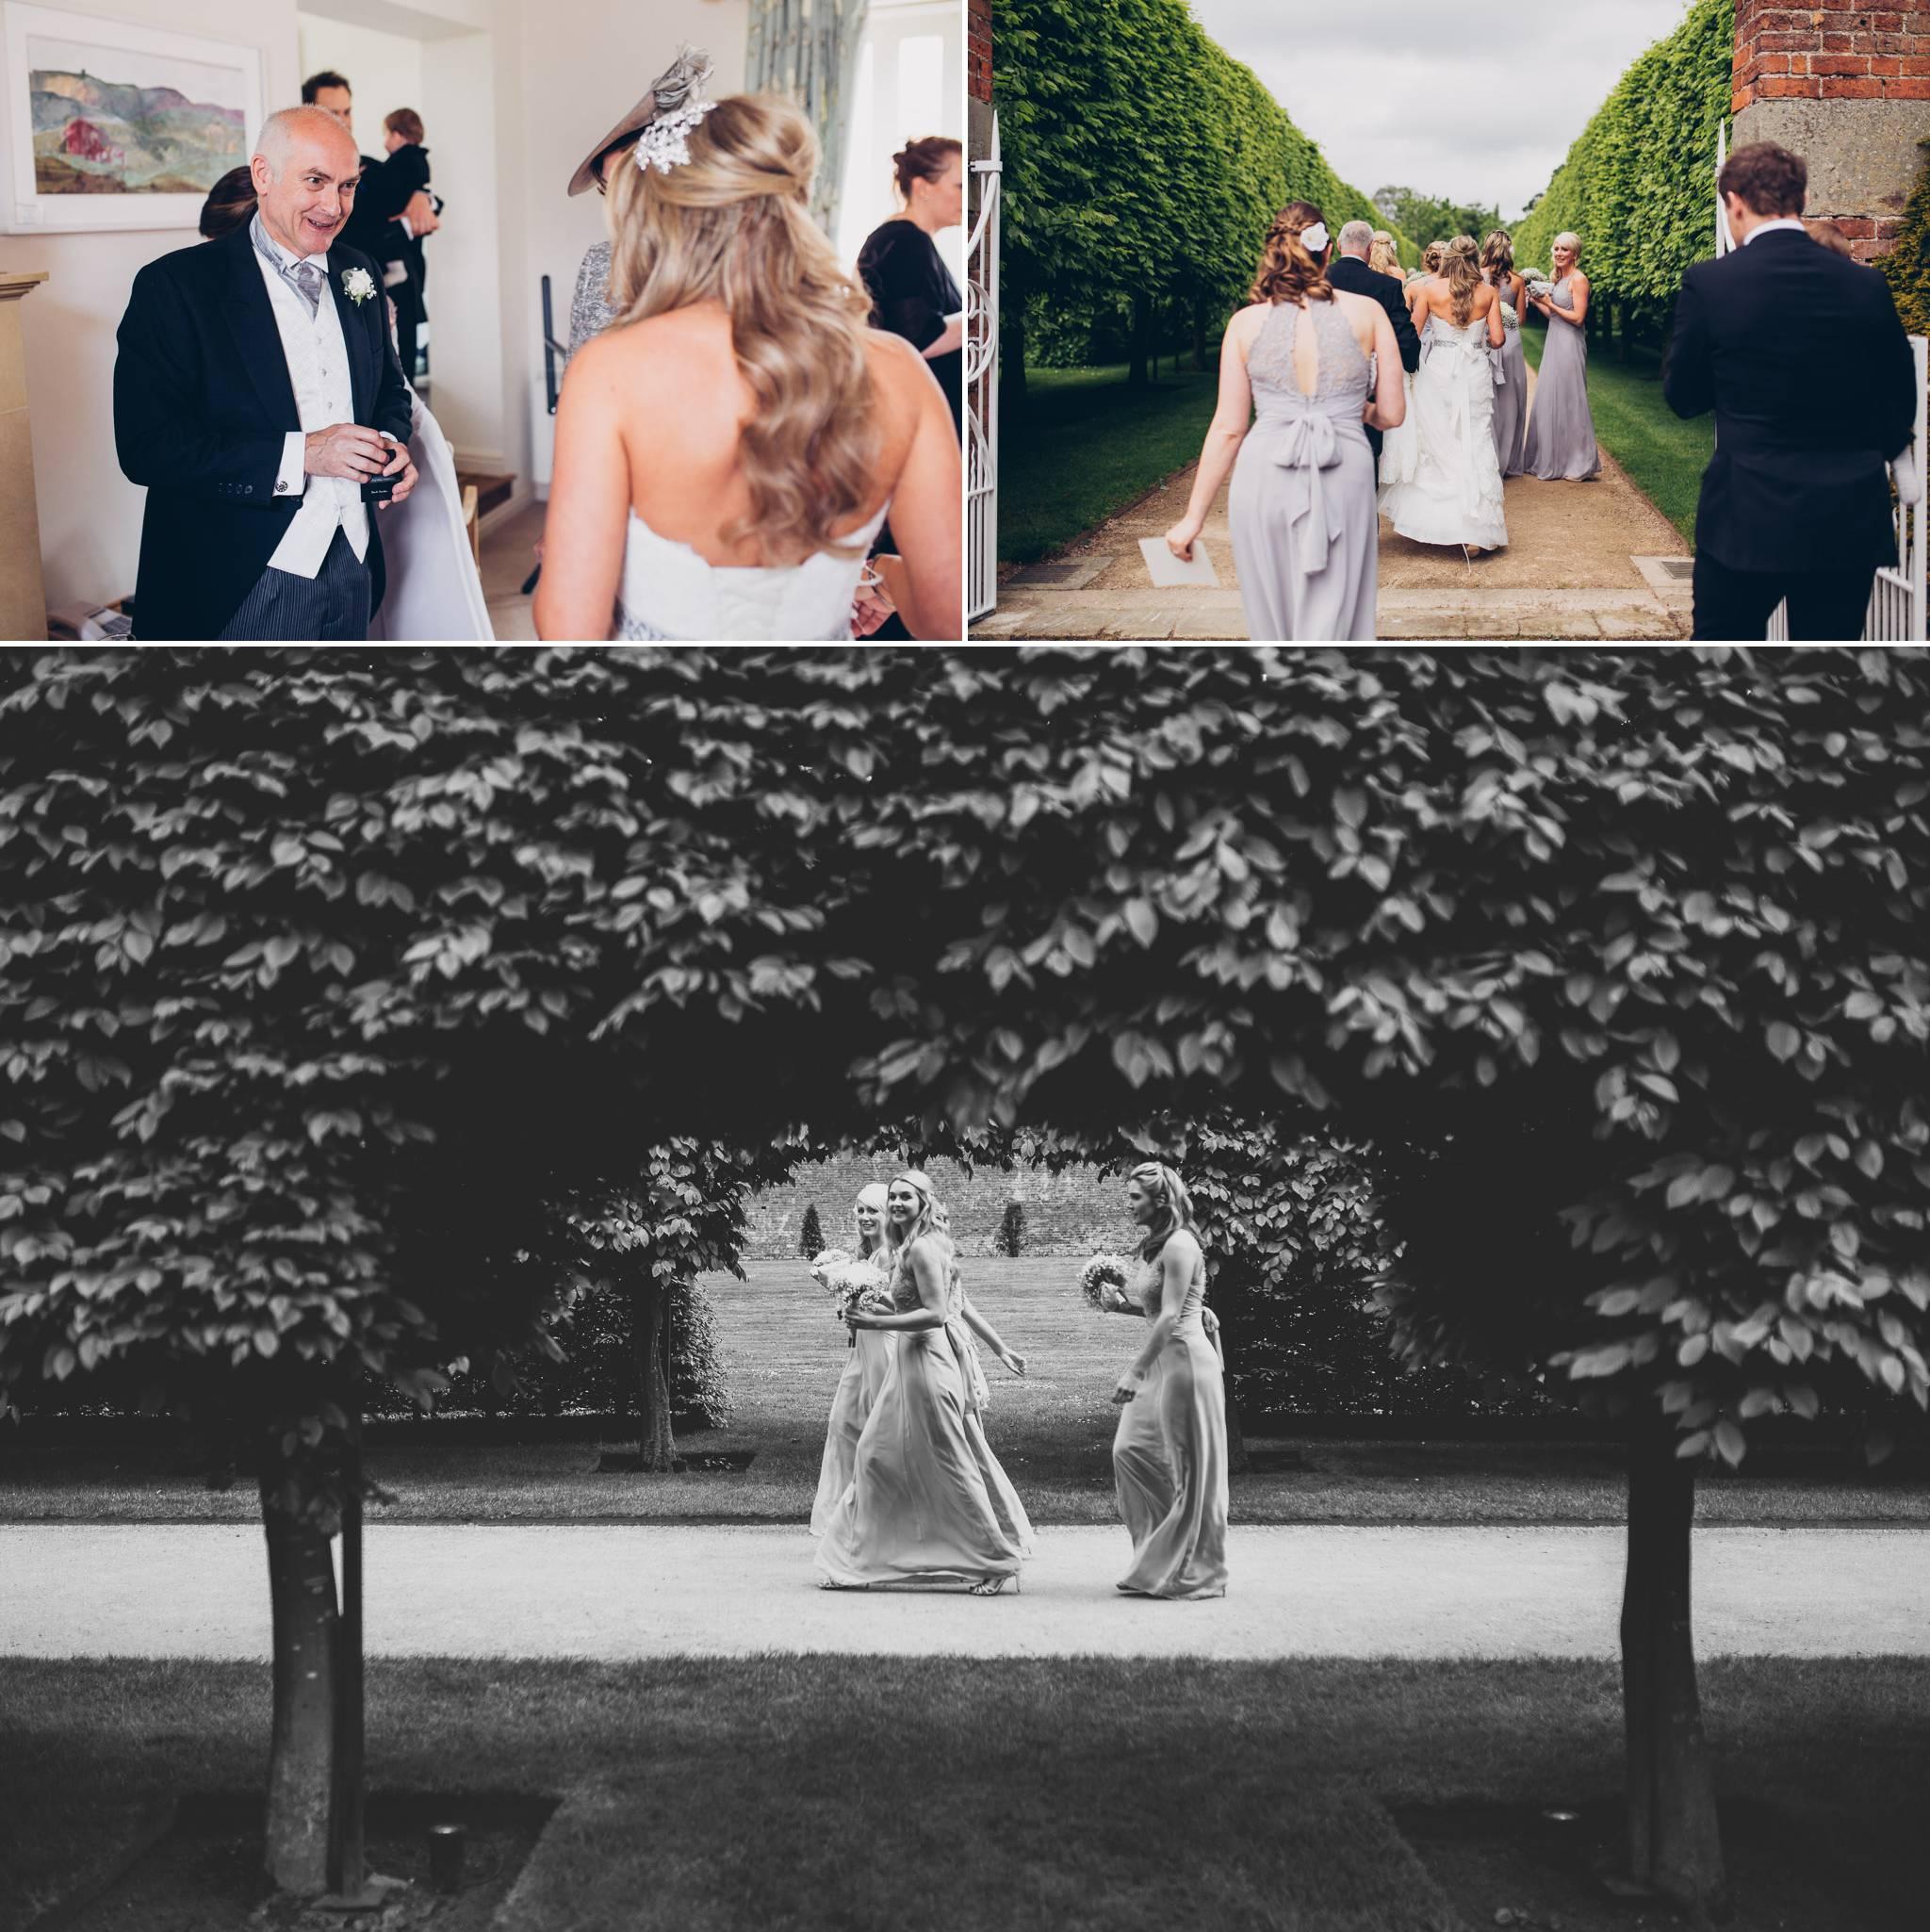 shropshire-wedding-photography 7.jpg